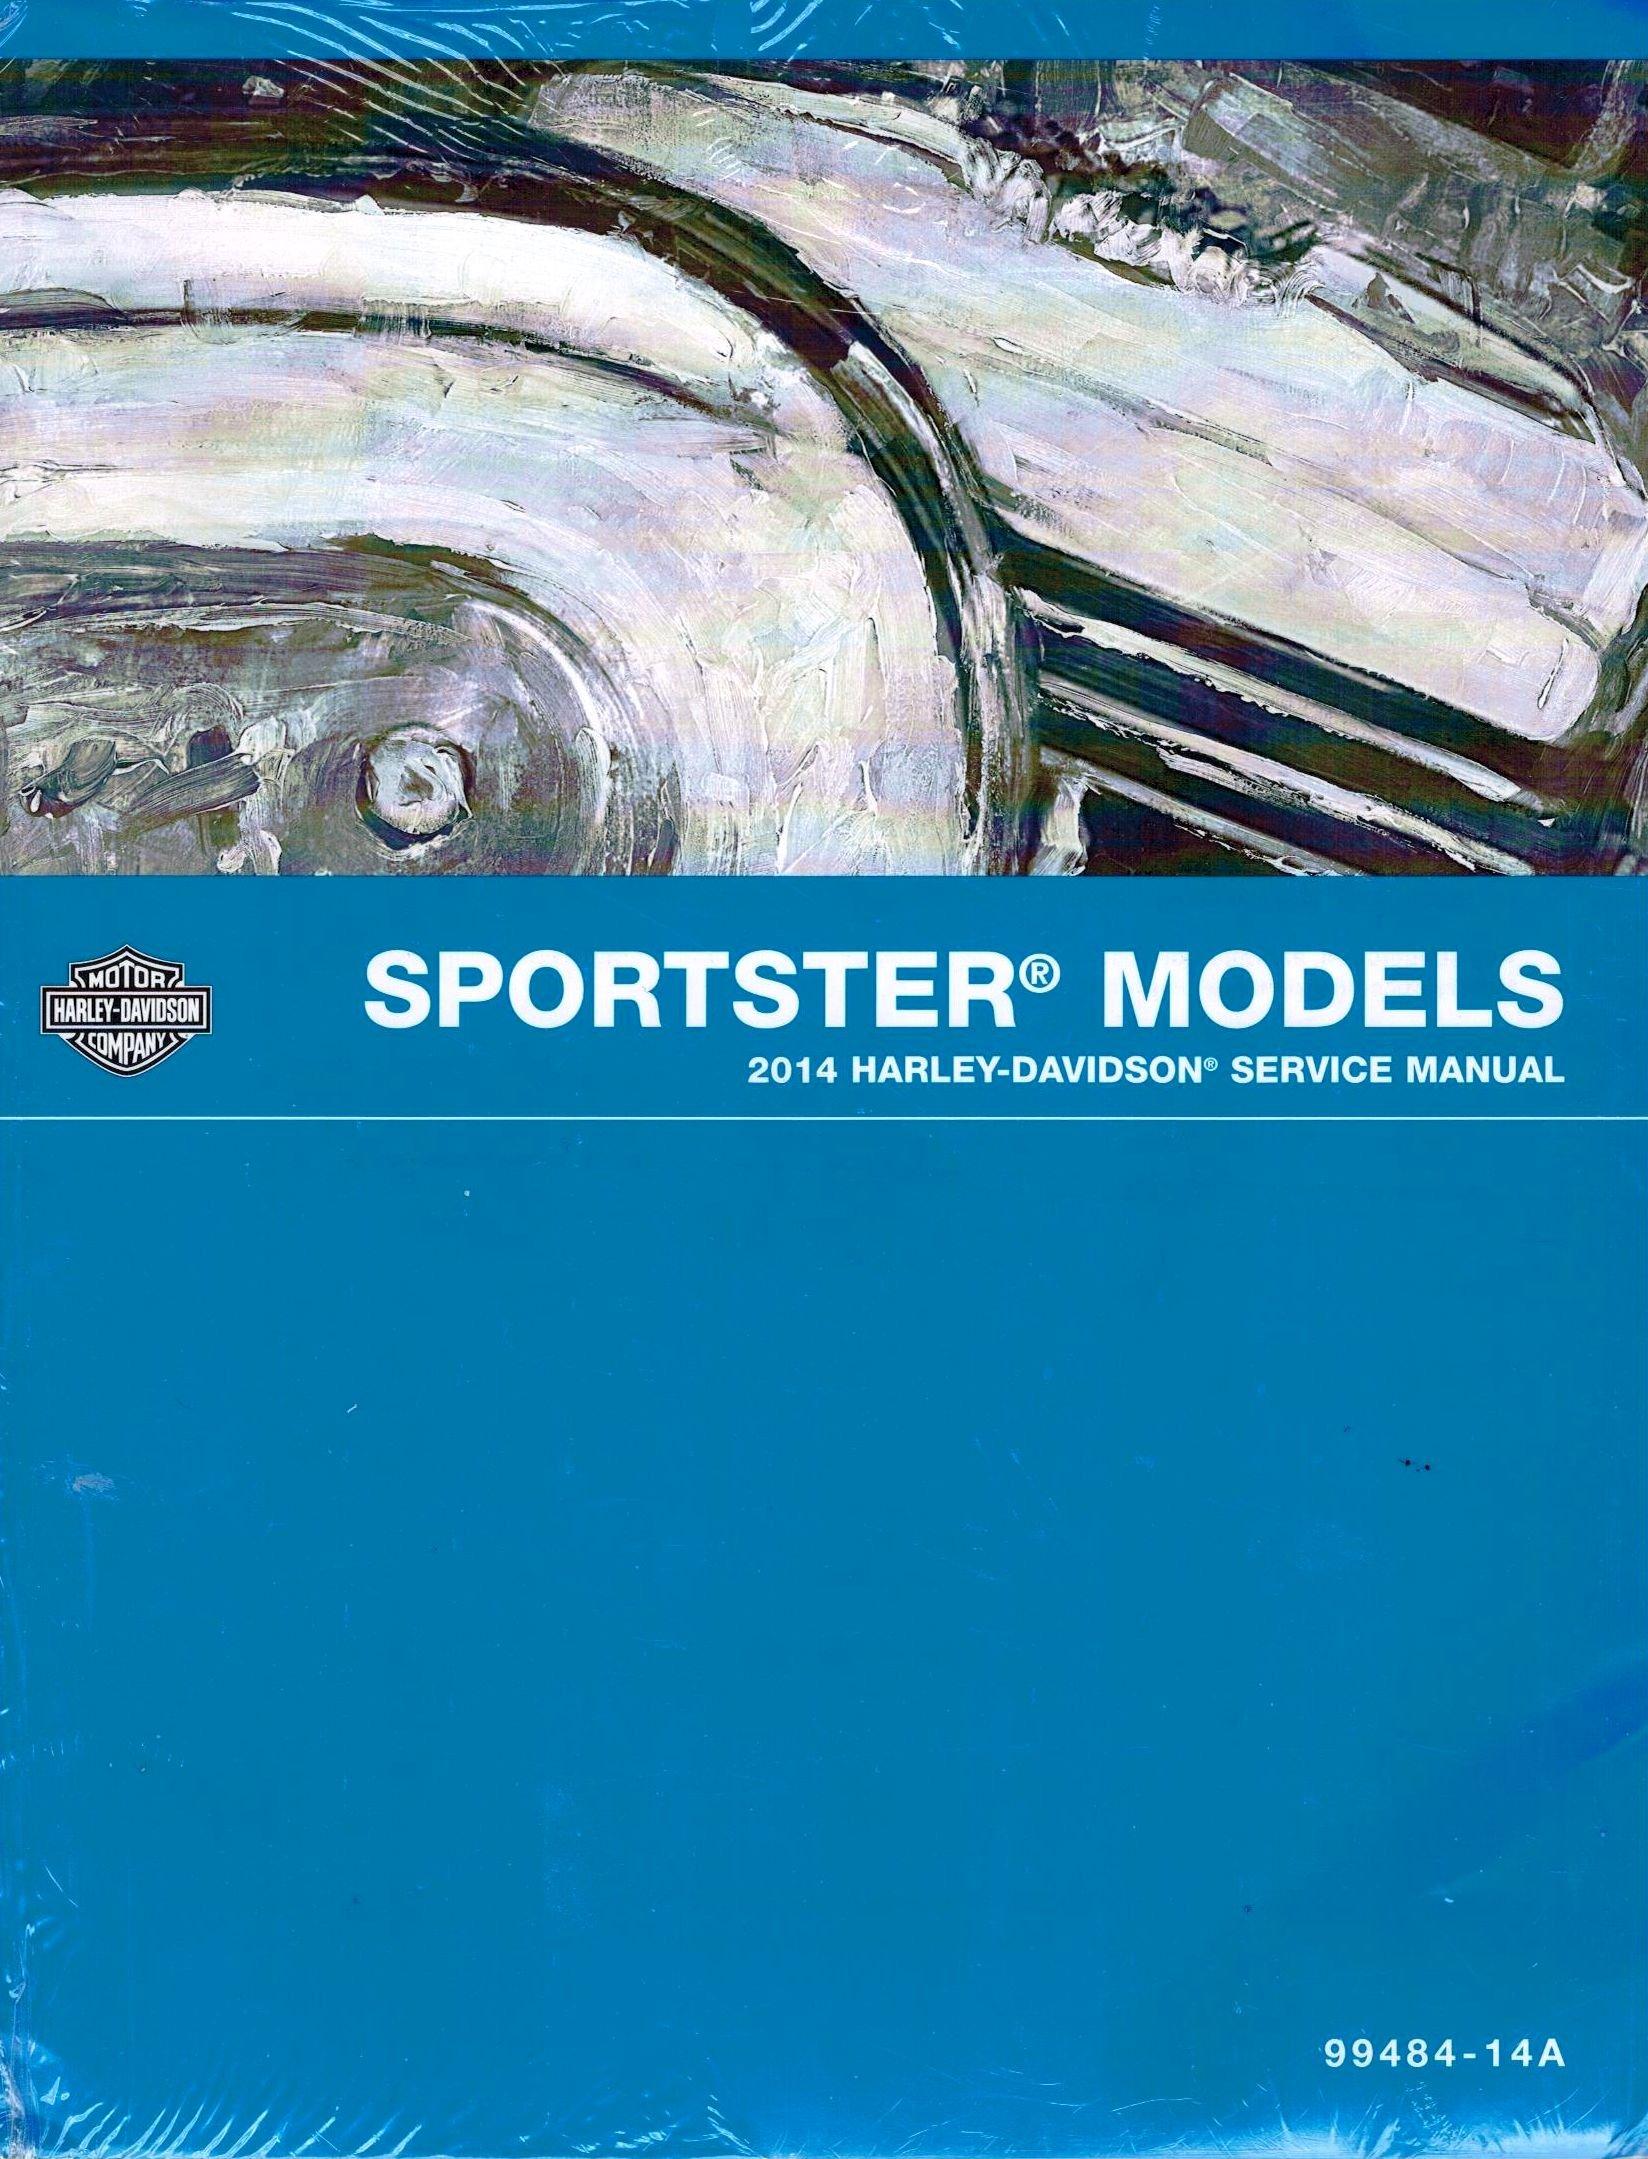 2014 Harley-Davidson Sportster Models Service Shop Repair Workshop Manual,  Part Number 99484-14A: Harley-Davidson Motor Company: Amazon.com: Books